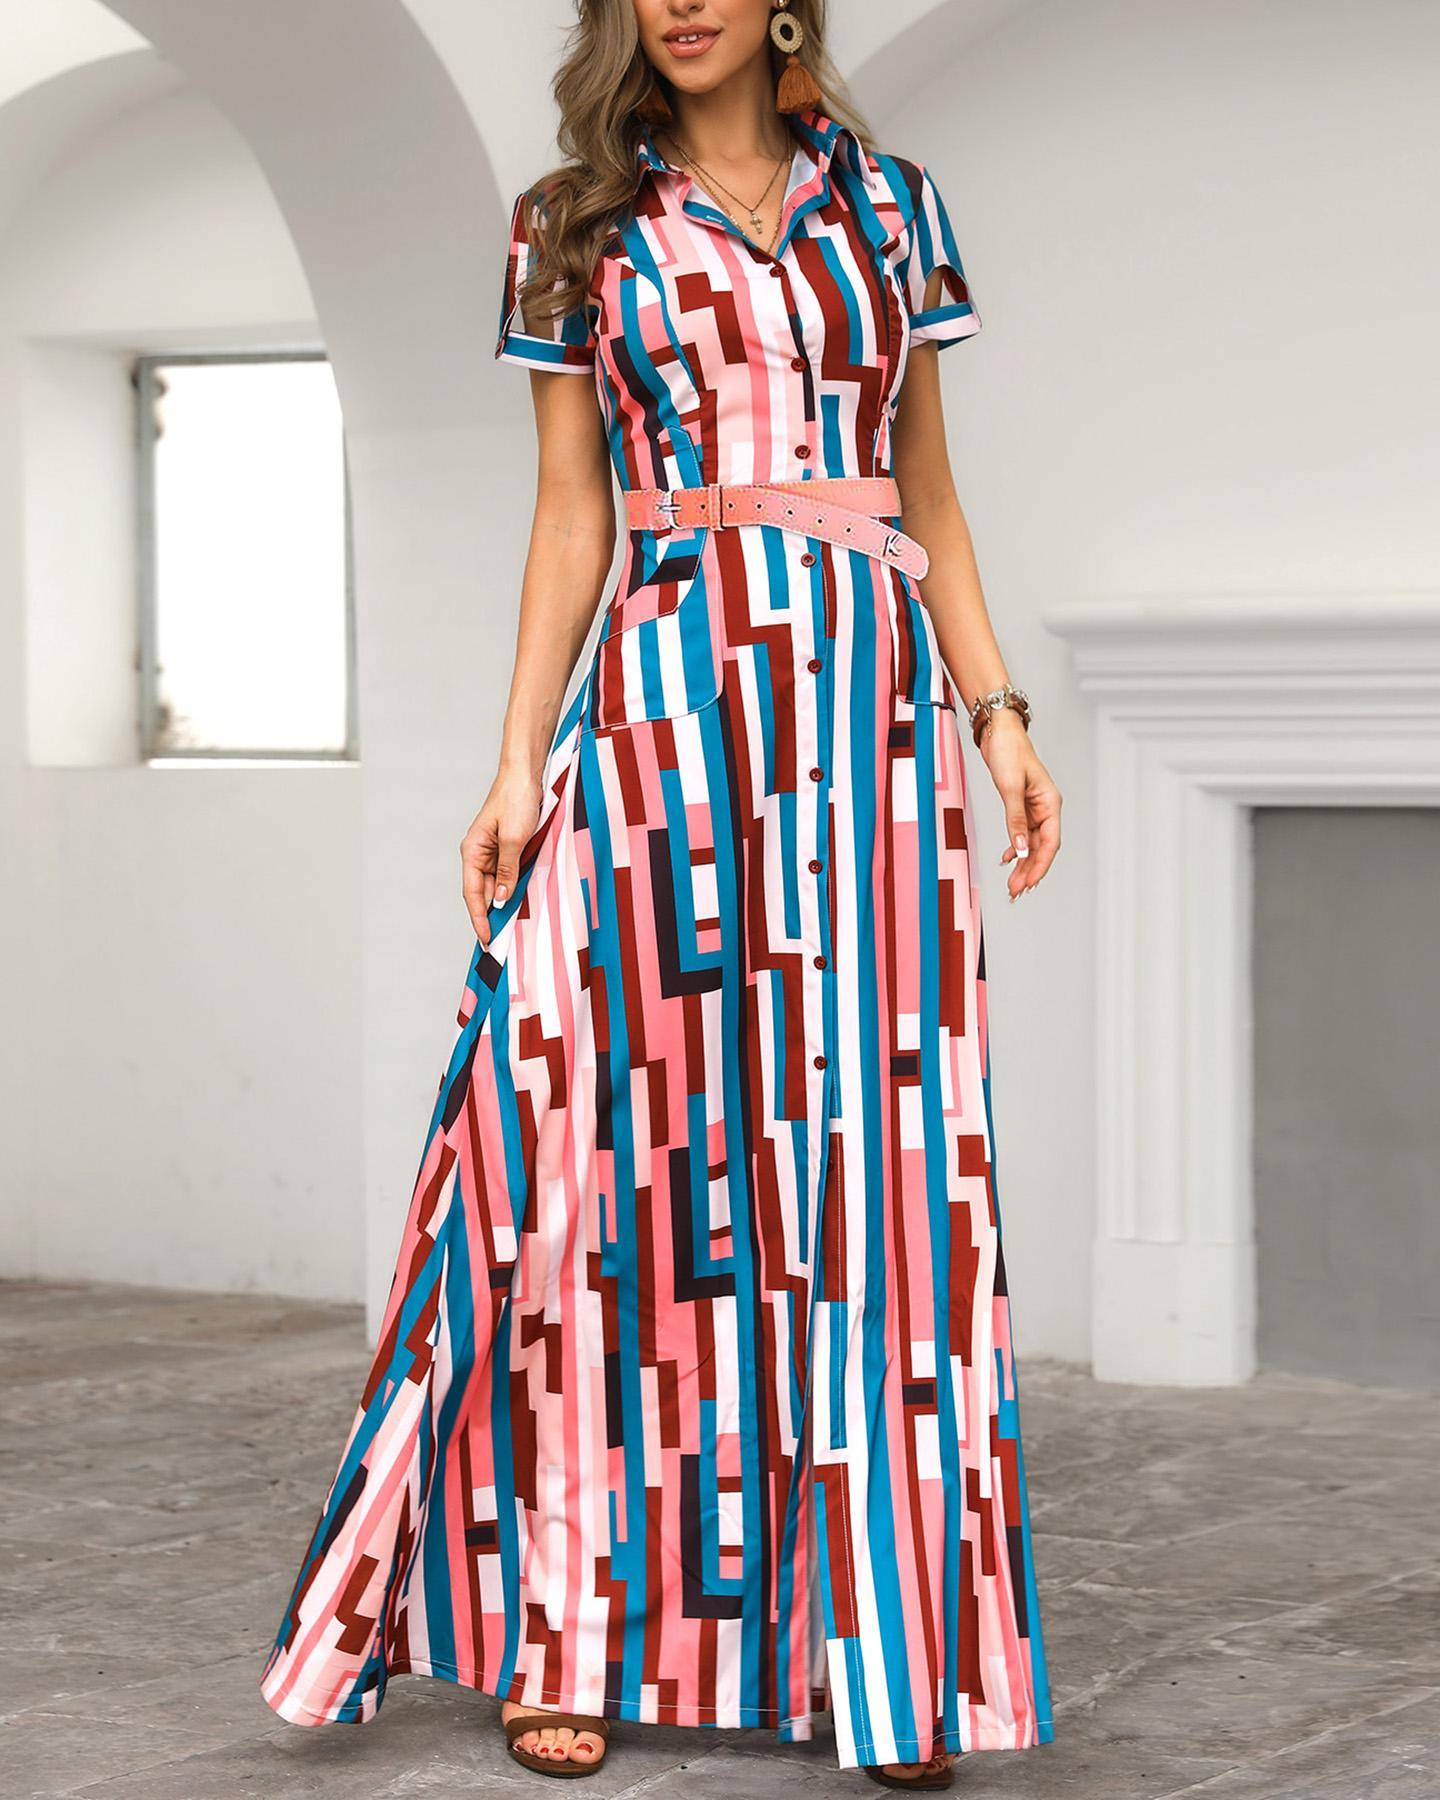 joyshoetique / Colorful Striped Print Shirt Maxi Dress